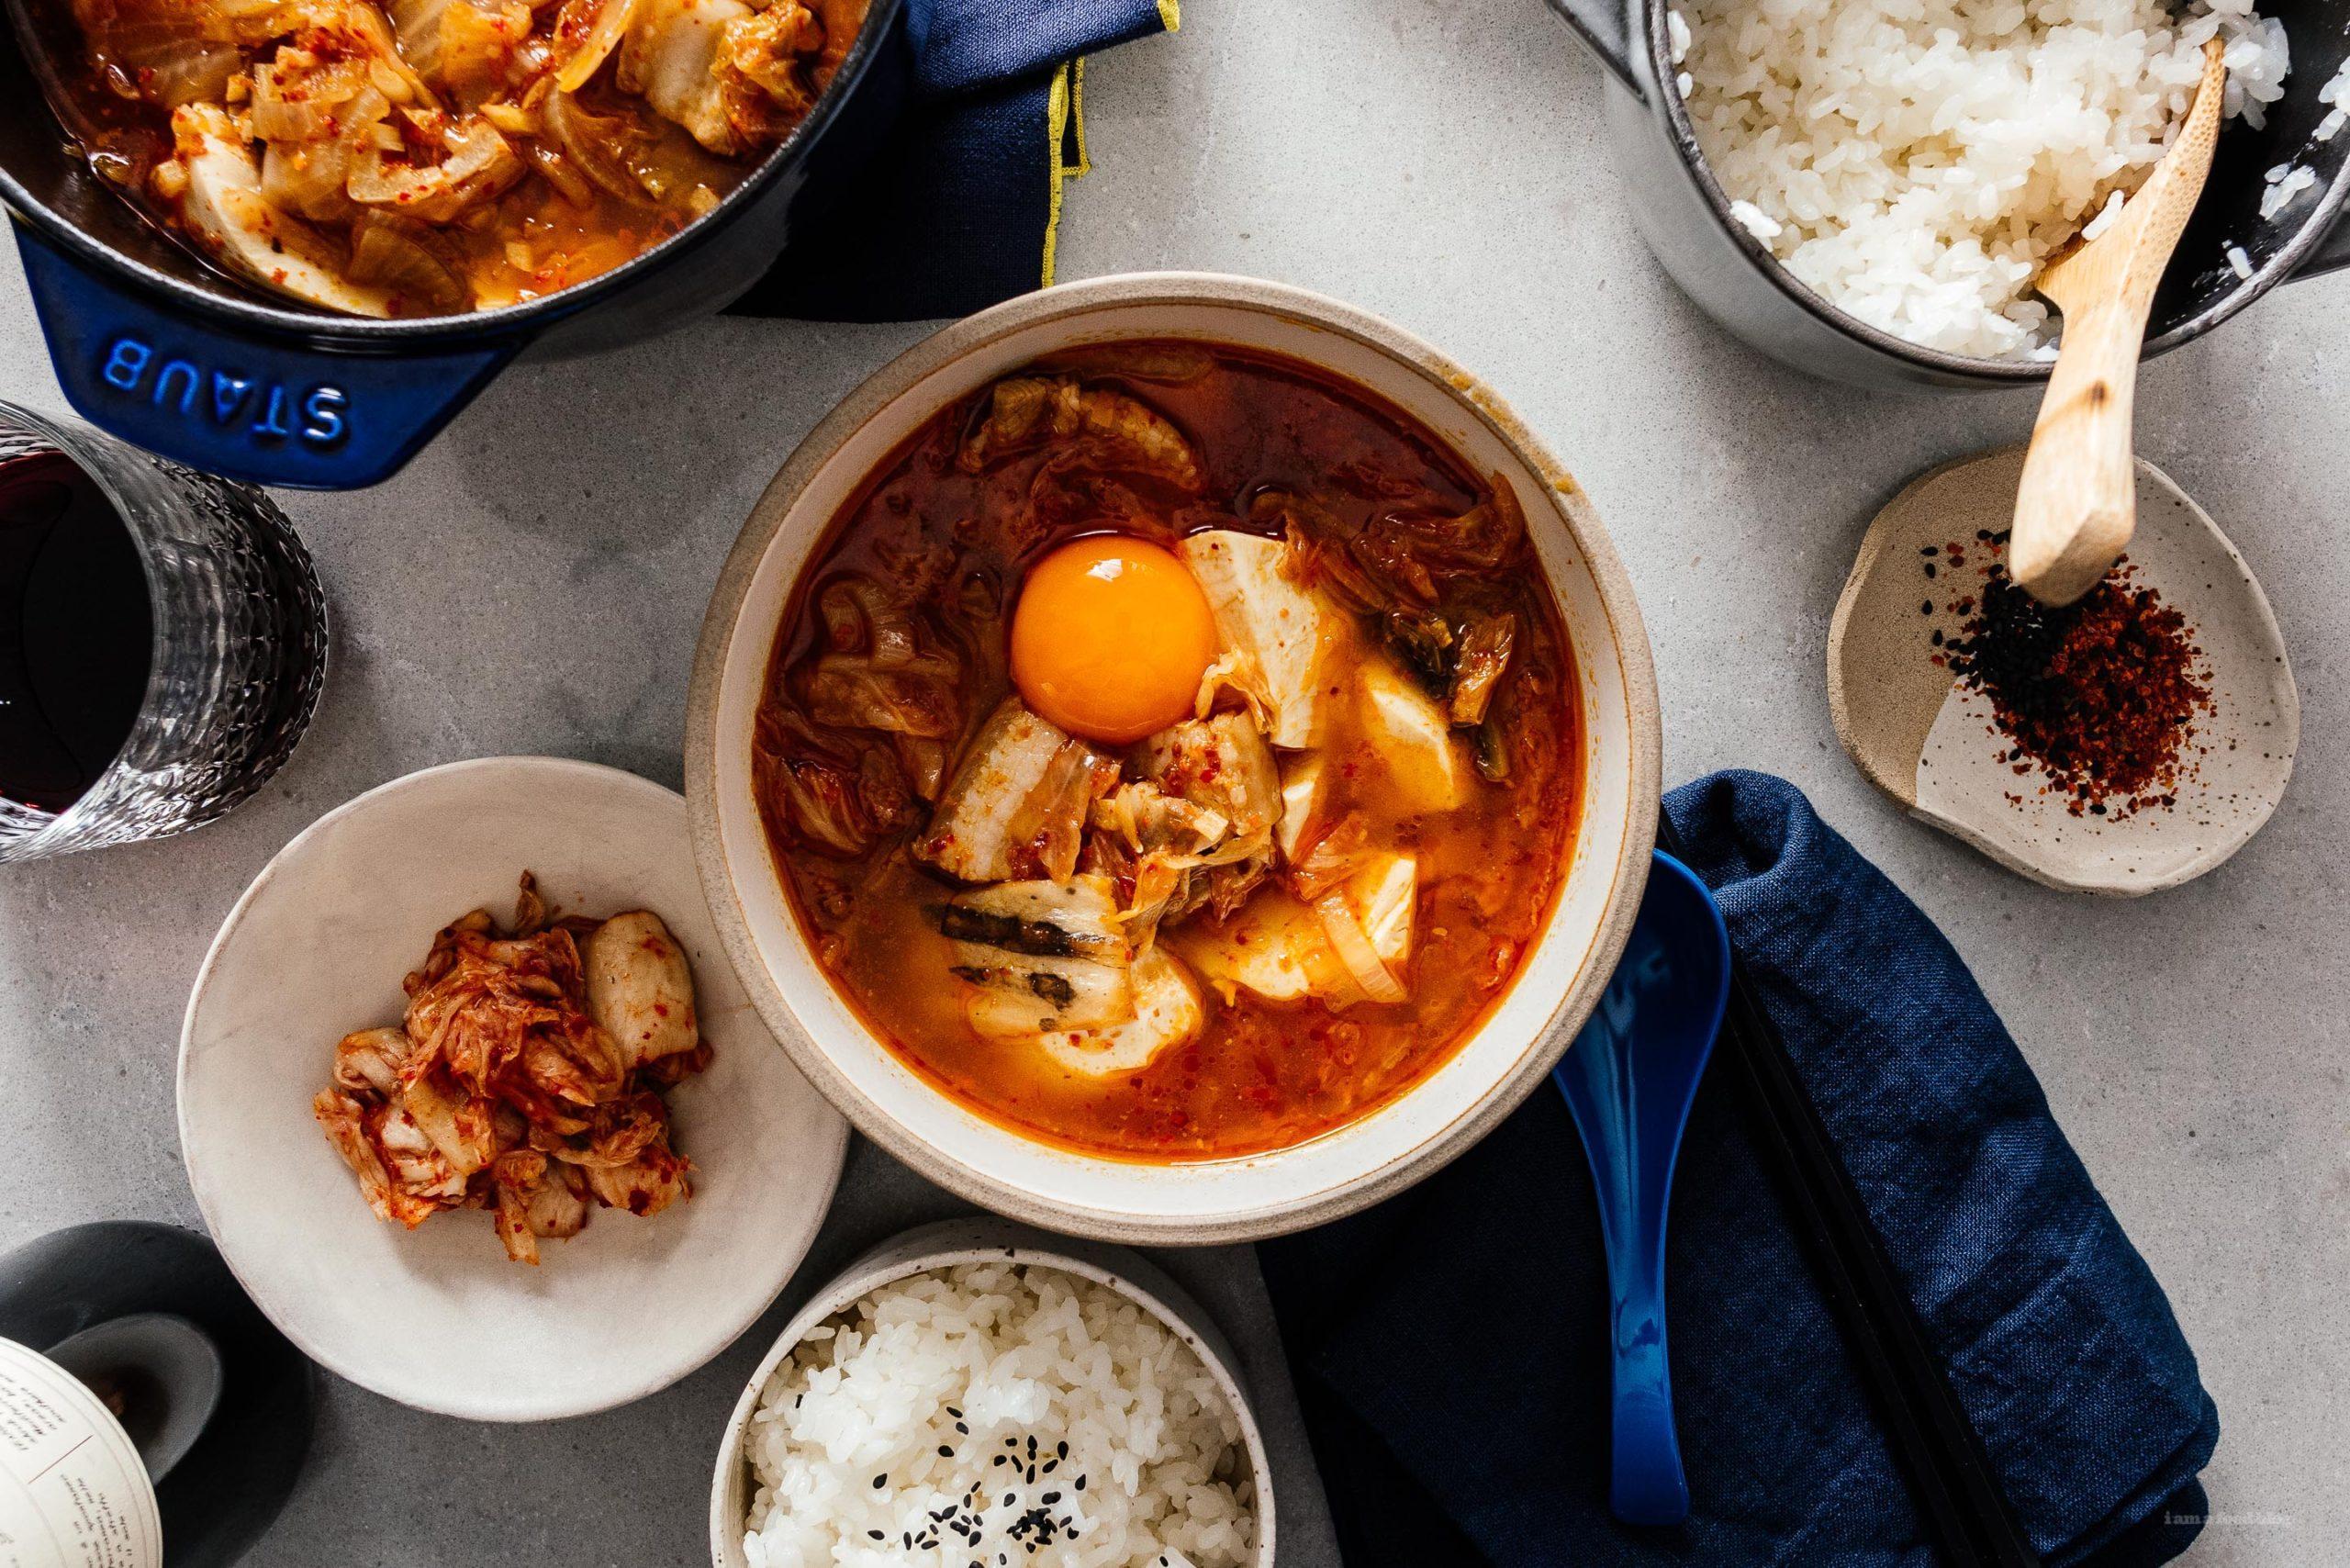 Sundubu Jjigae Kimchi Soft Tofu Stew | www.iamafoodblog.com